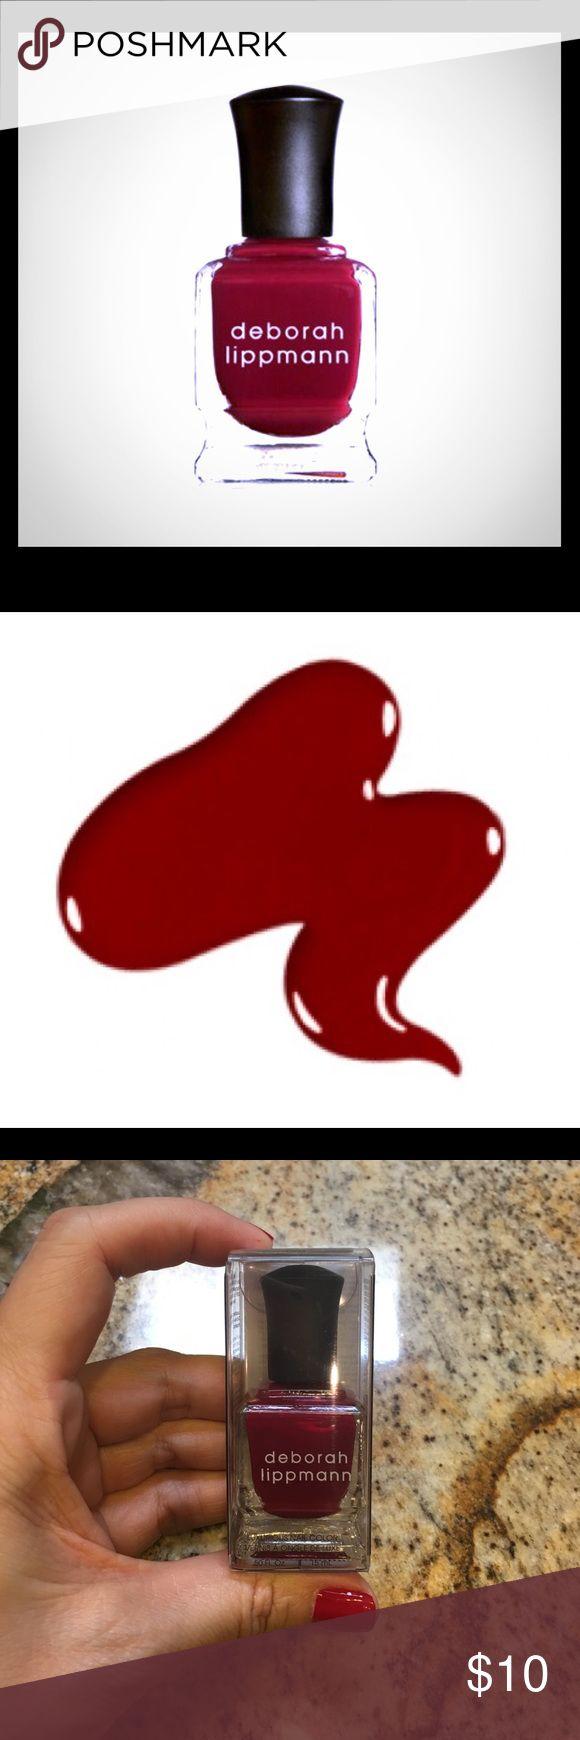 "NIB Deborah Lippmann Nail Polish Gorgeous ""Lady is a Tramp"" nail polish from celebrity manicurist Deborah Lippmann. This red is ""classic with a side of temptation""! Brand new in box! Bundle and save! deborah lippmann Makeup"